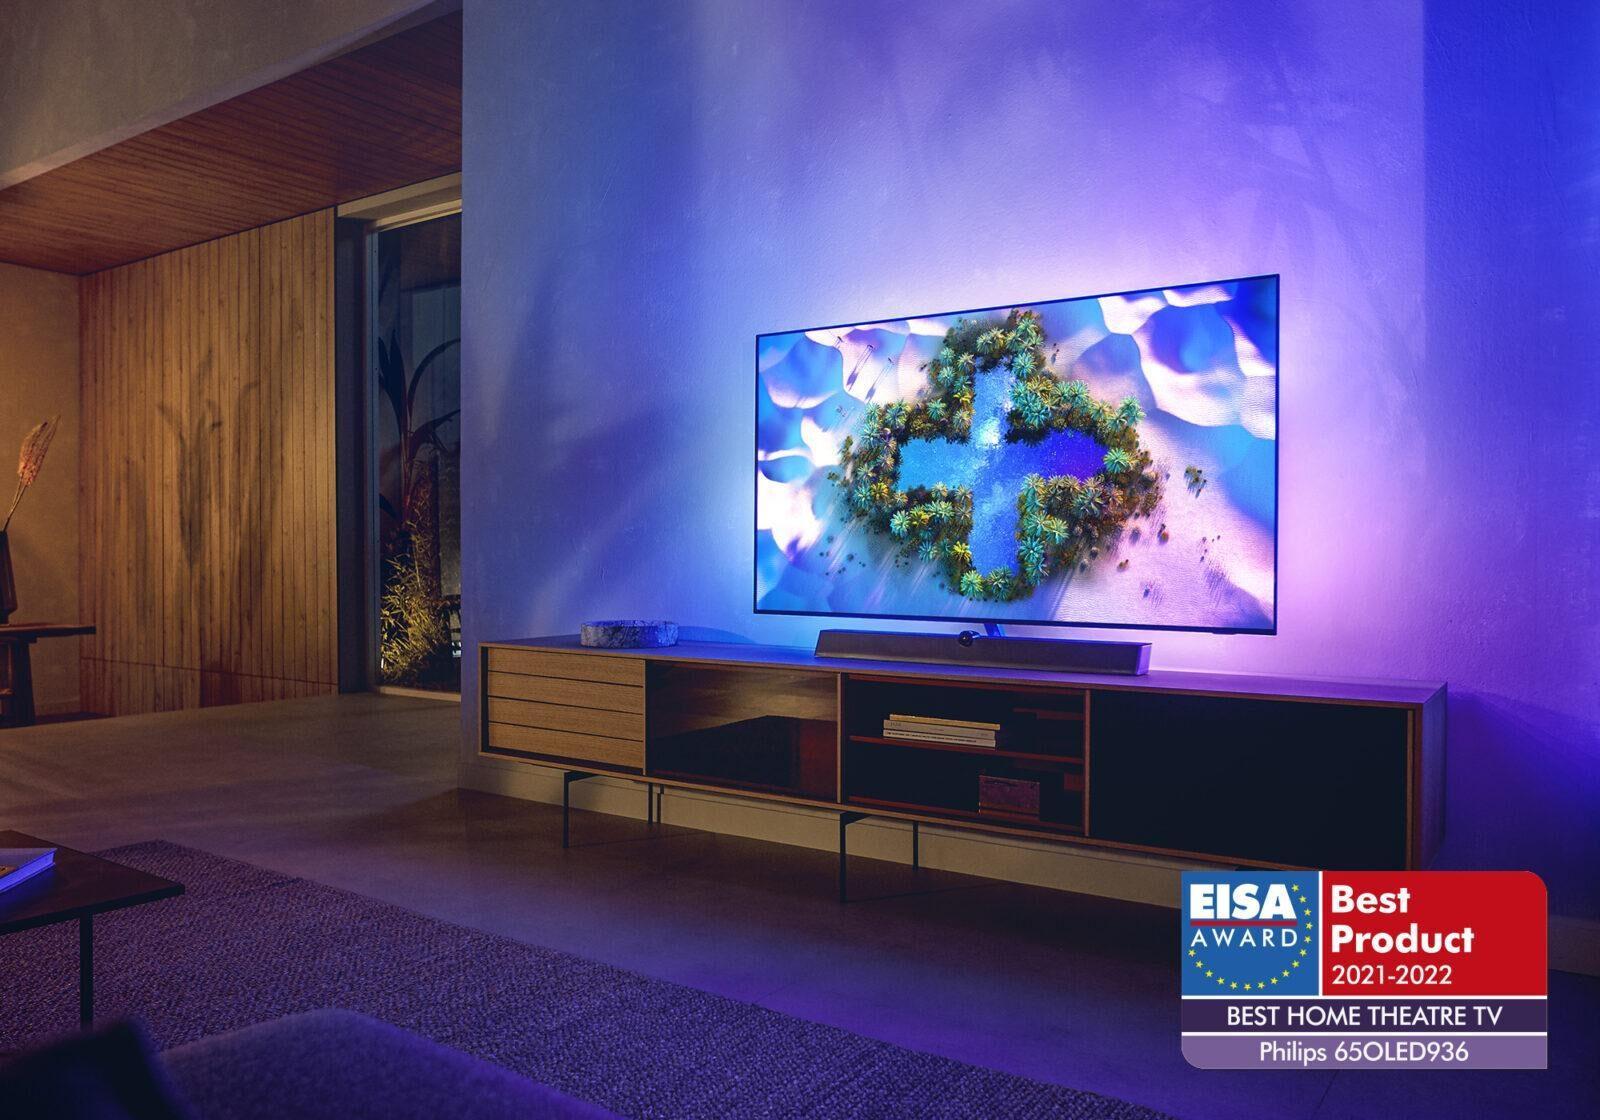 Аудиотехника и телевизоры Philips получили четыре премии EISA (oled 936 lifestyle)